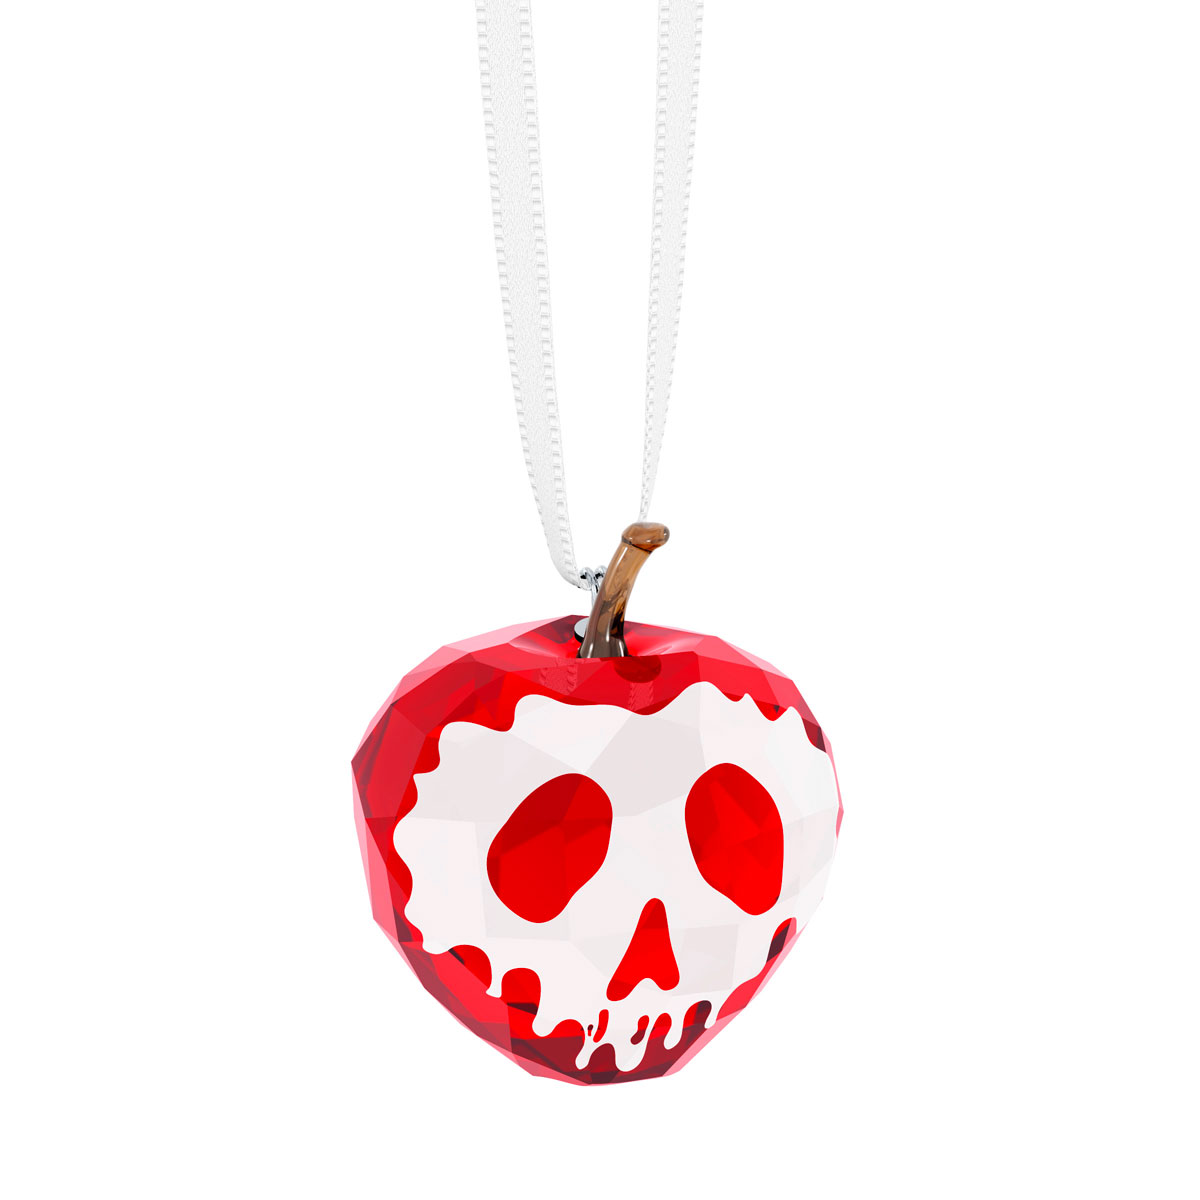 Swarovski Crystal Disney Snow White Collection Poisoned Apple Ornament